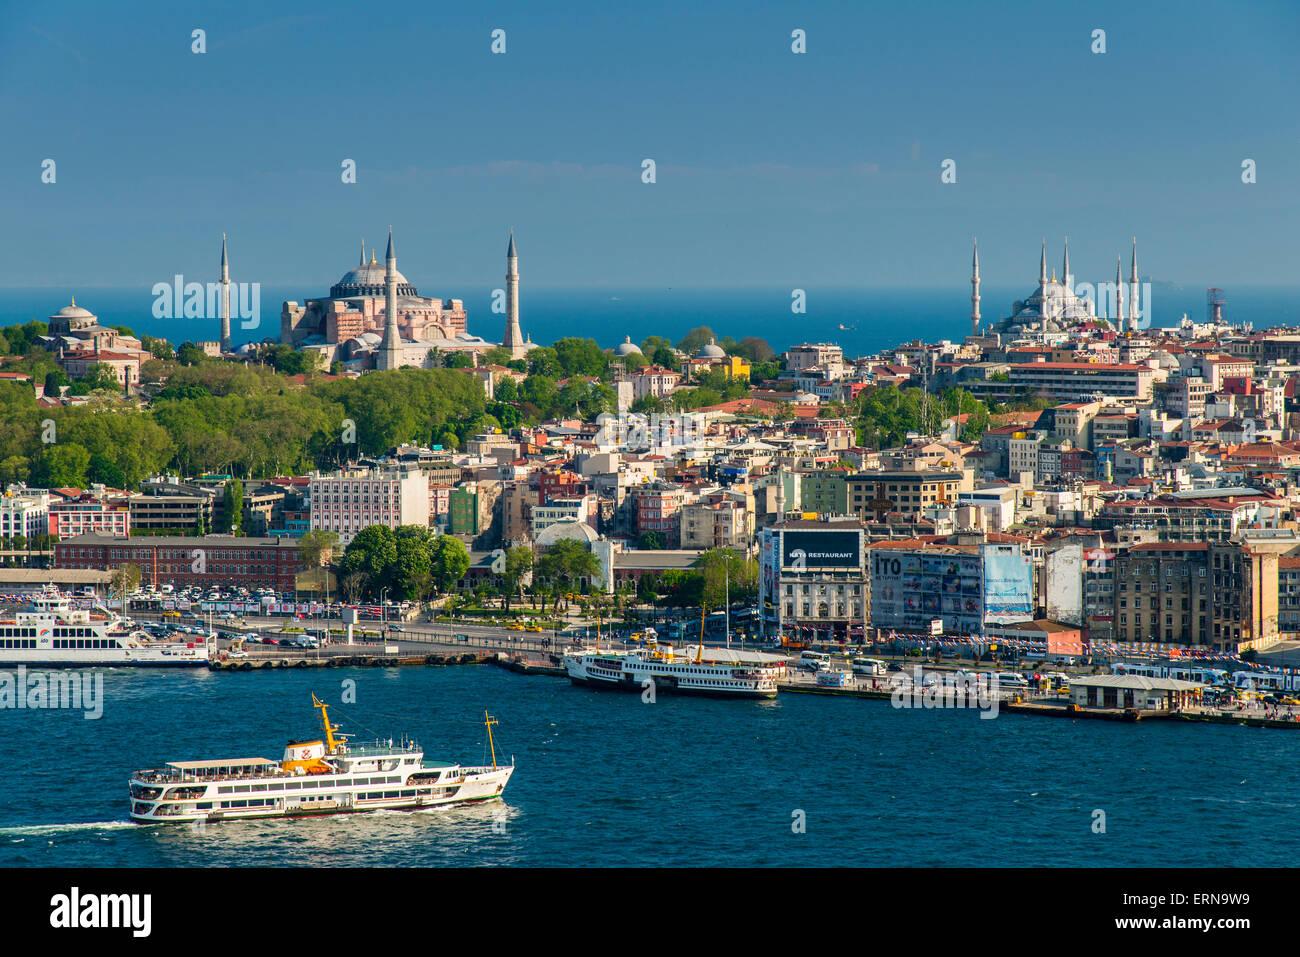 City skyline avec Bosphurus Strait, Istanbul, Turquie Photo Stock